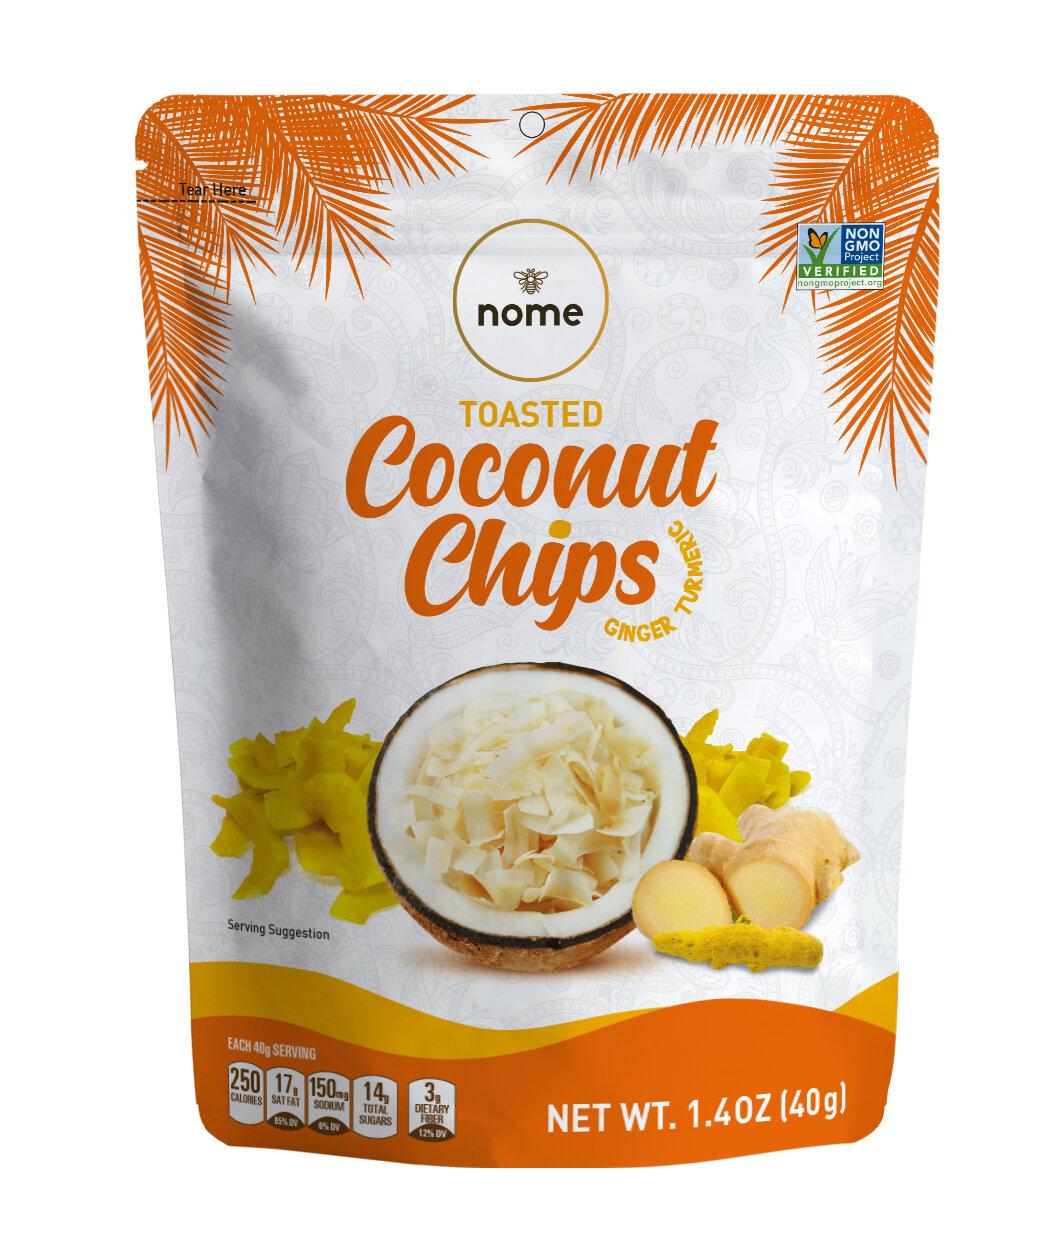 Nome Coconut Chips 1.4oz Ginger Turmeric.jpg